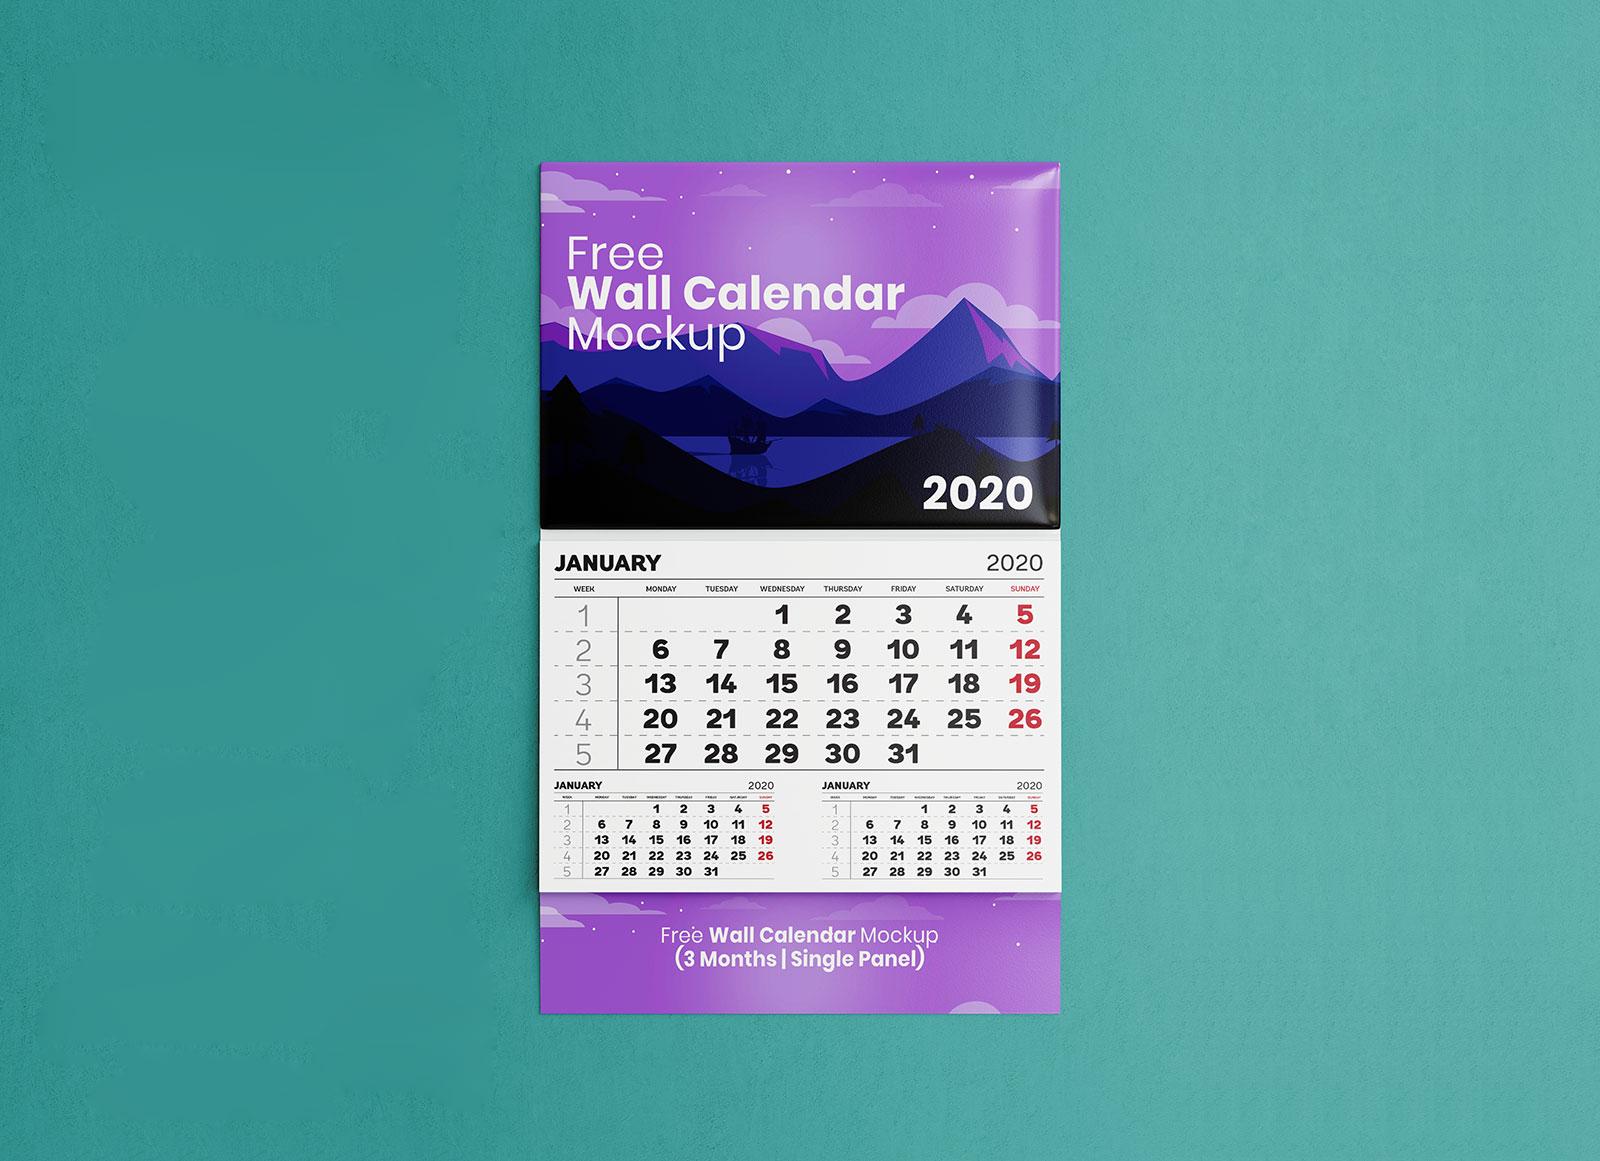 Free-Single-Panel-3-Month-Wall-Calendar-Mockup-PSD